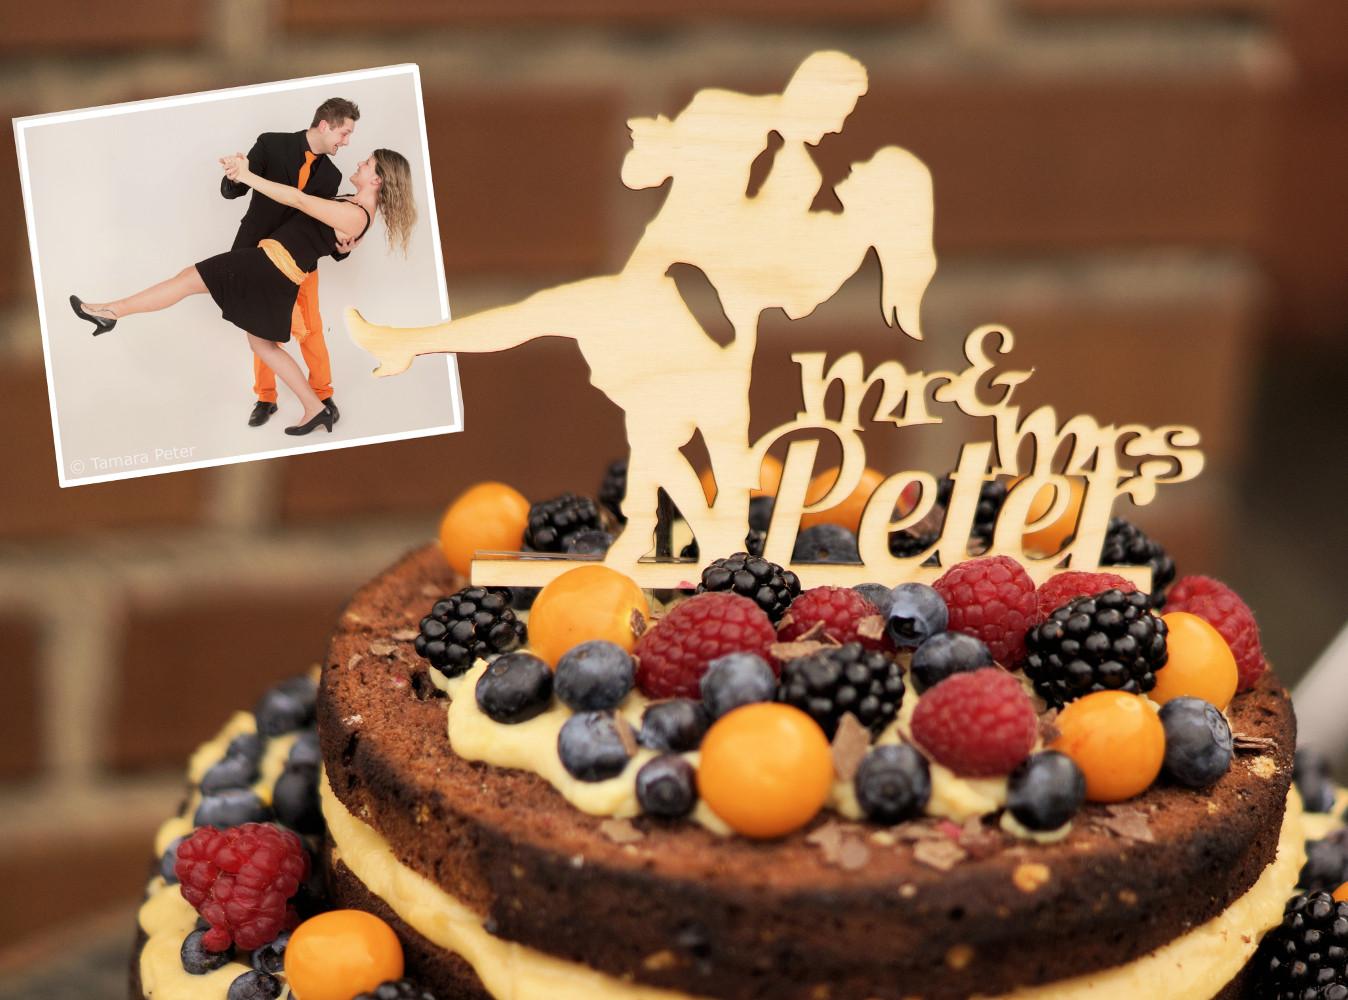 Fotogruesse: DIY: Naked Cake - Hochzeitstorte selber backen